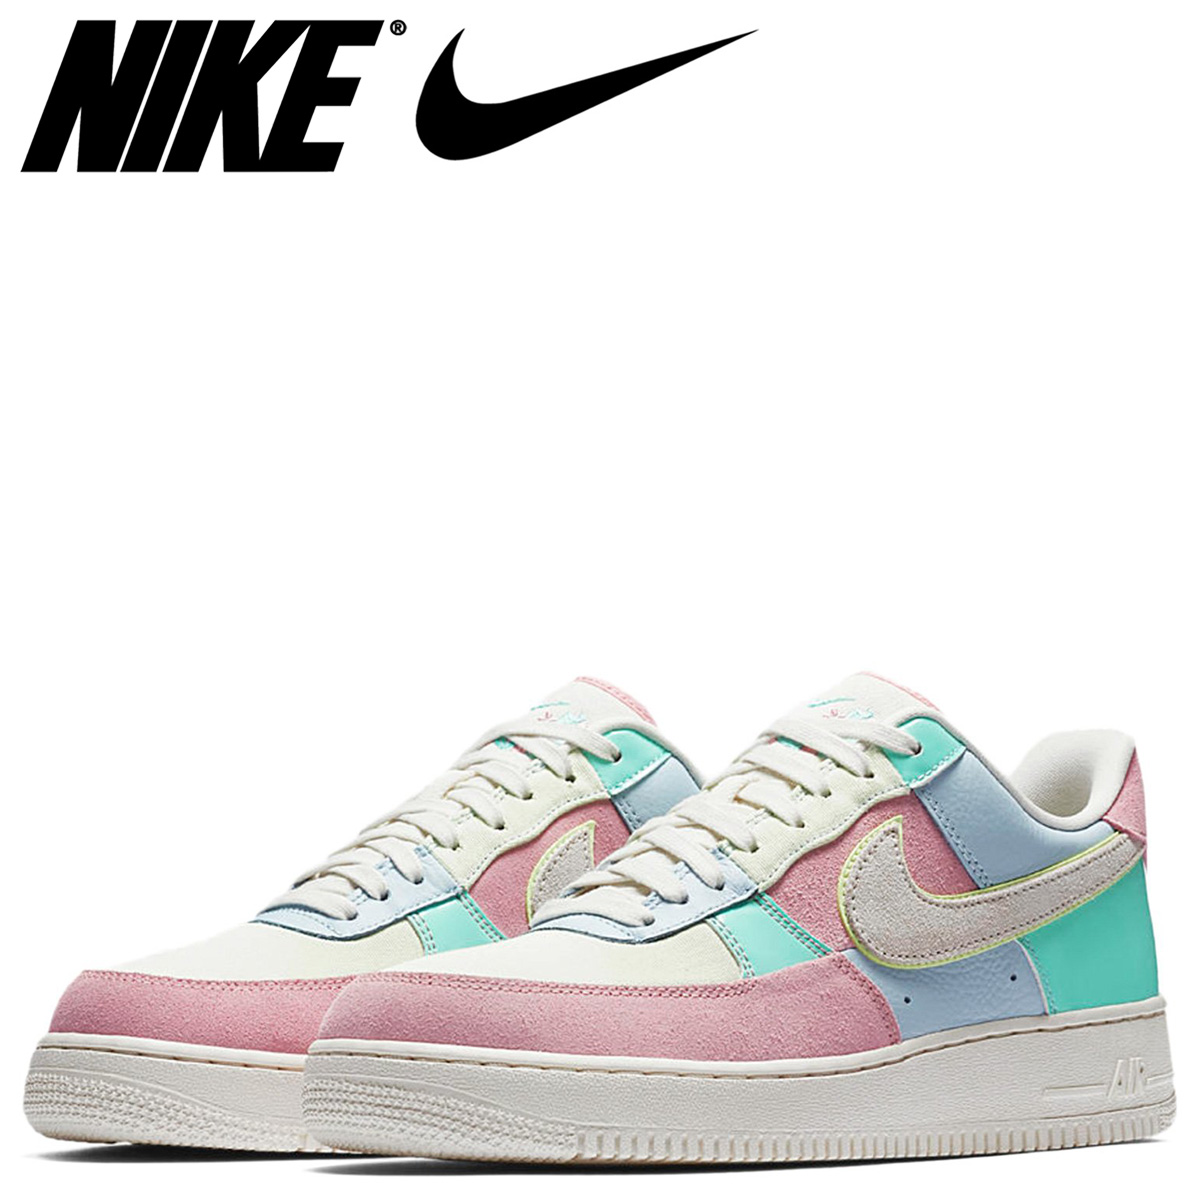 low priced 7997c 7990a NIKE AIR FORCE 1 LOW EASTER EGG Nike air force 1 sneakers men AH8462-400 ...